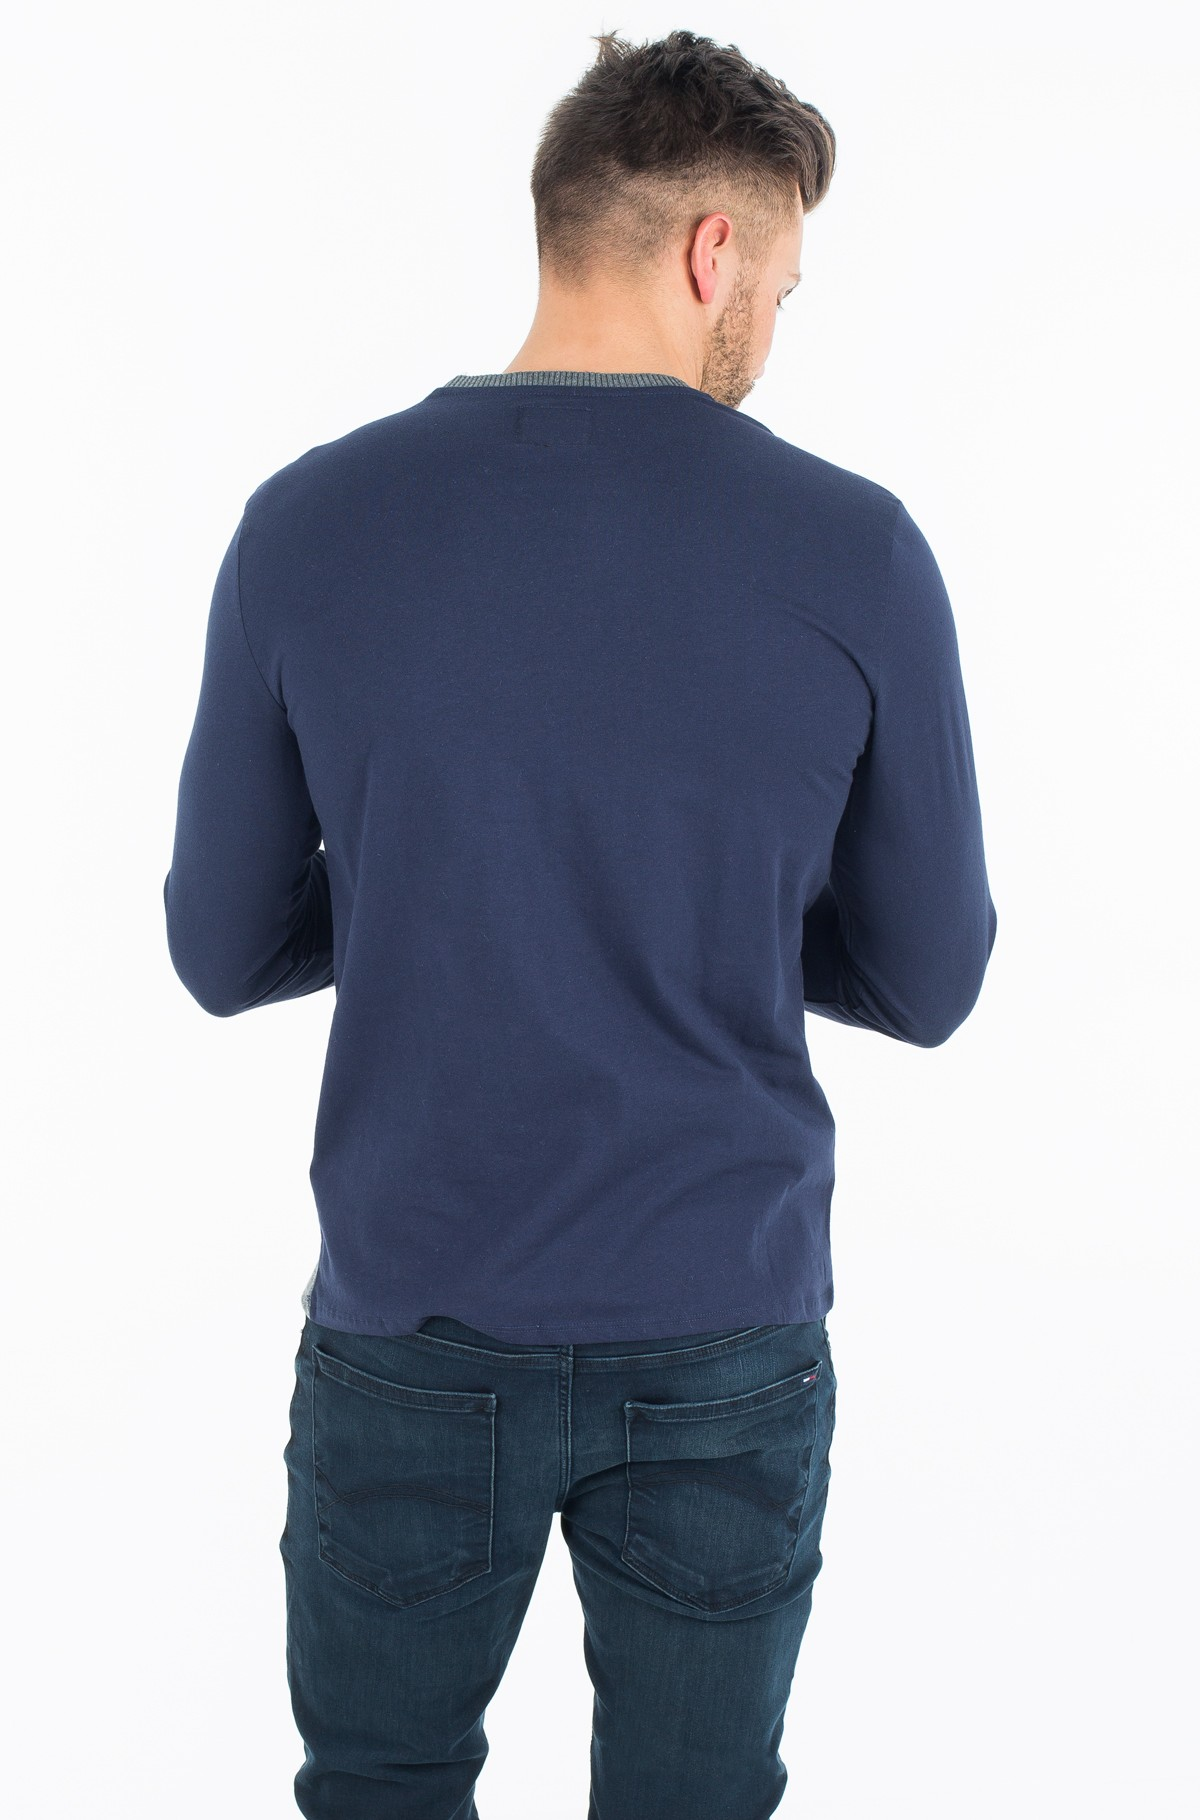 T-krekls ar garām piedurknēm  M74P02 K7BA0-full-2